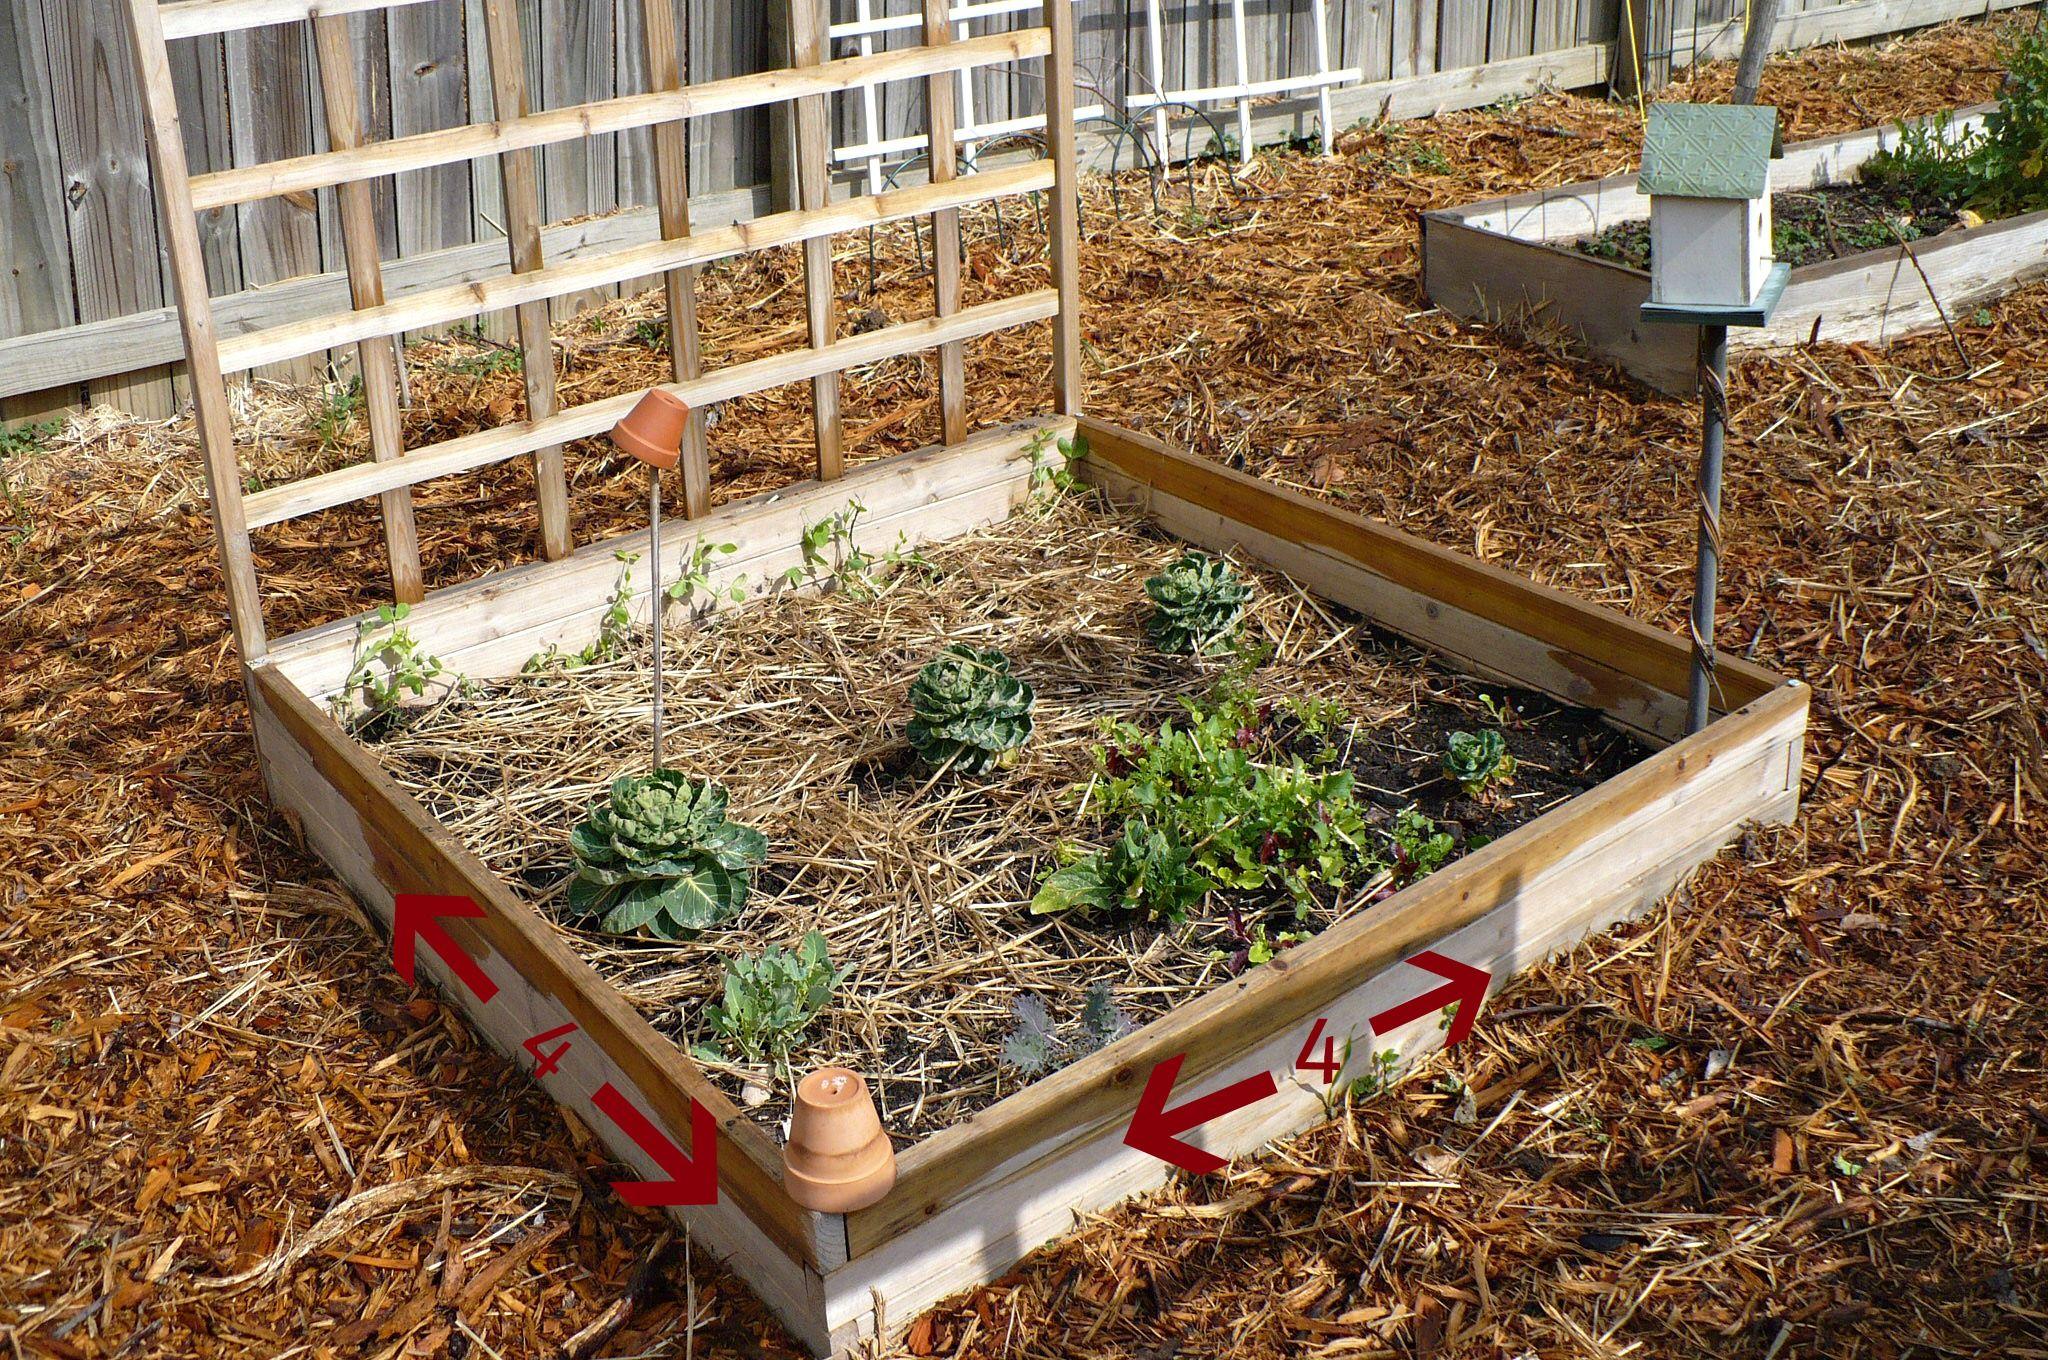 raised bed plans - Google Search   garden   Pinterest   Raised bed ...